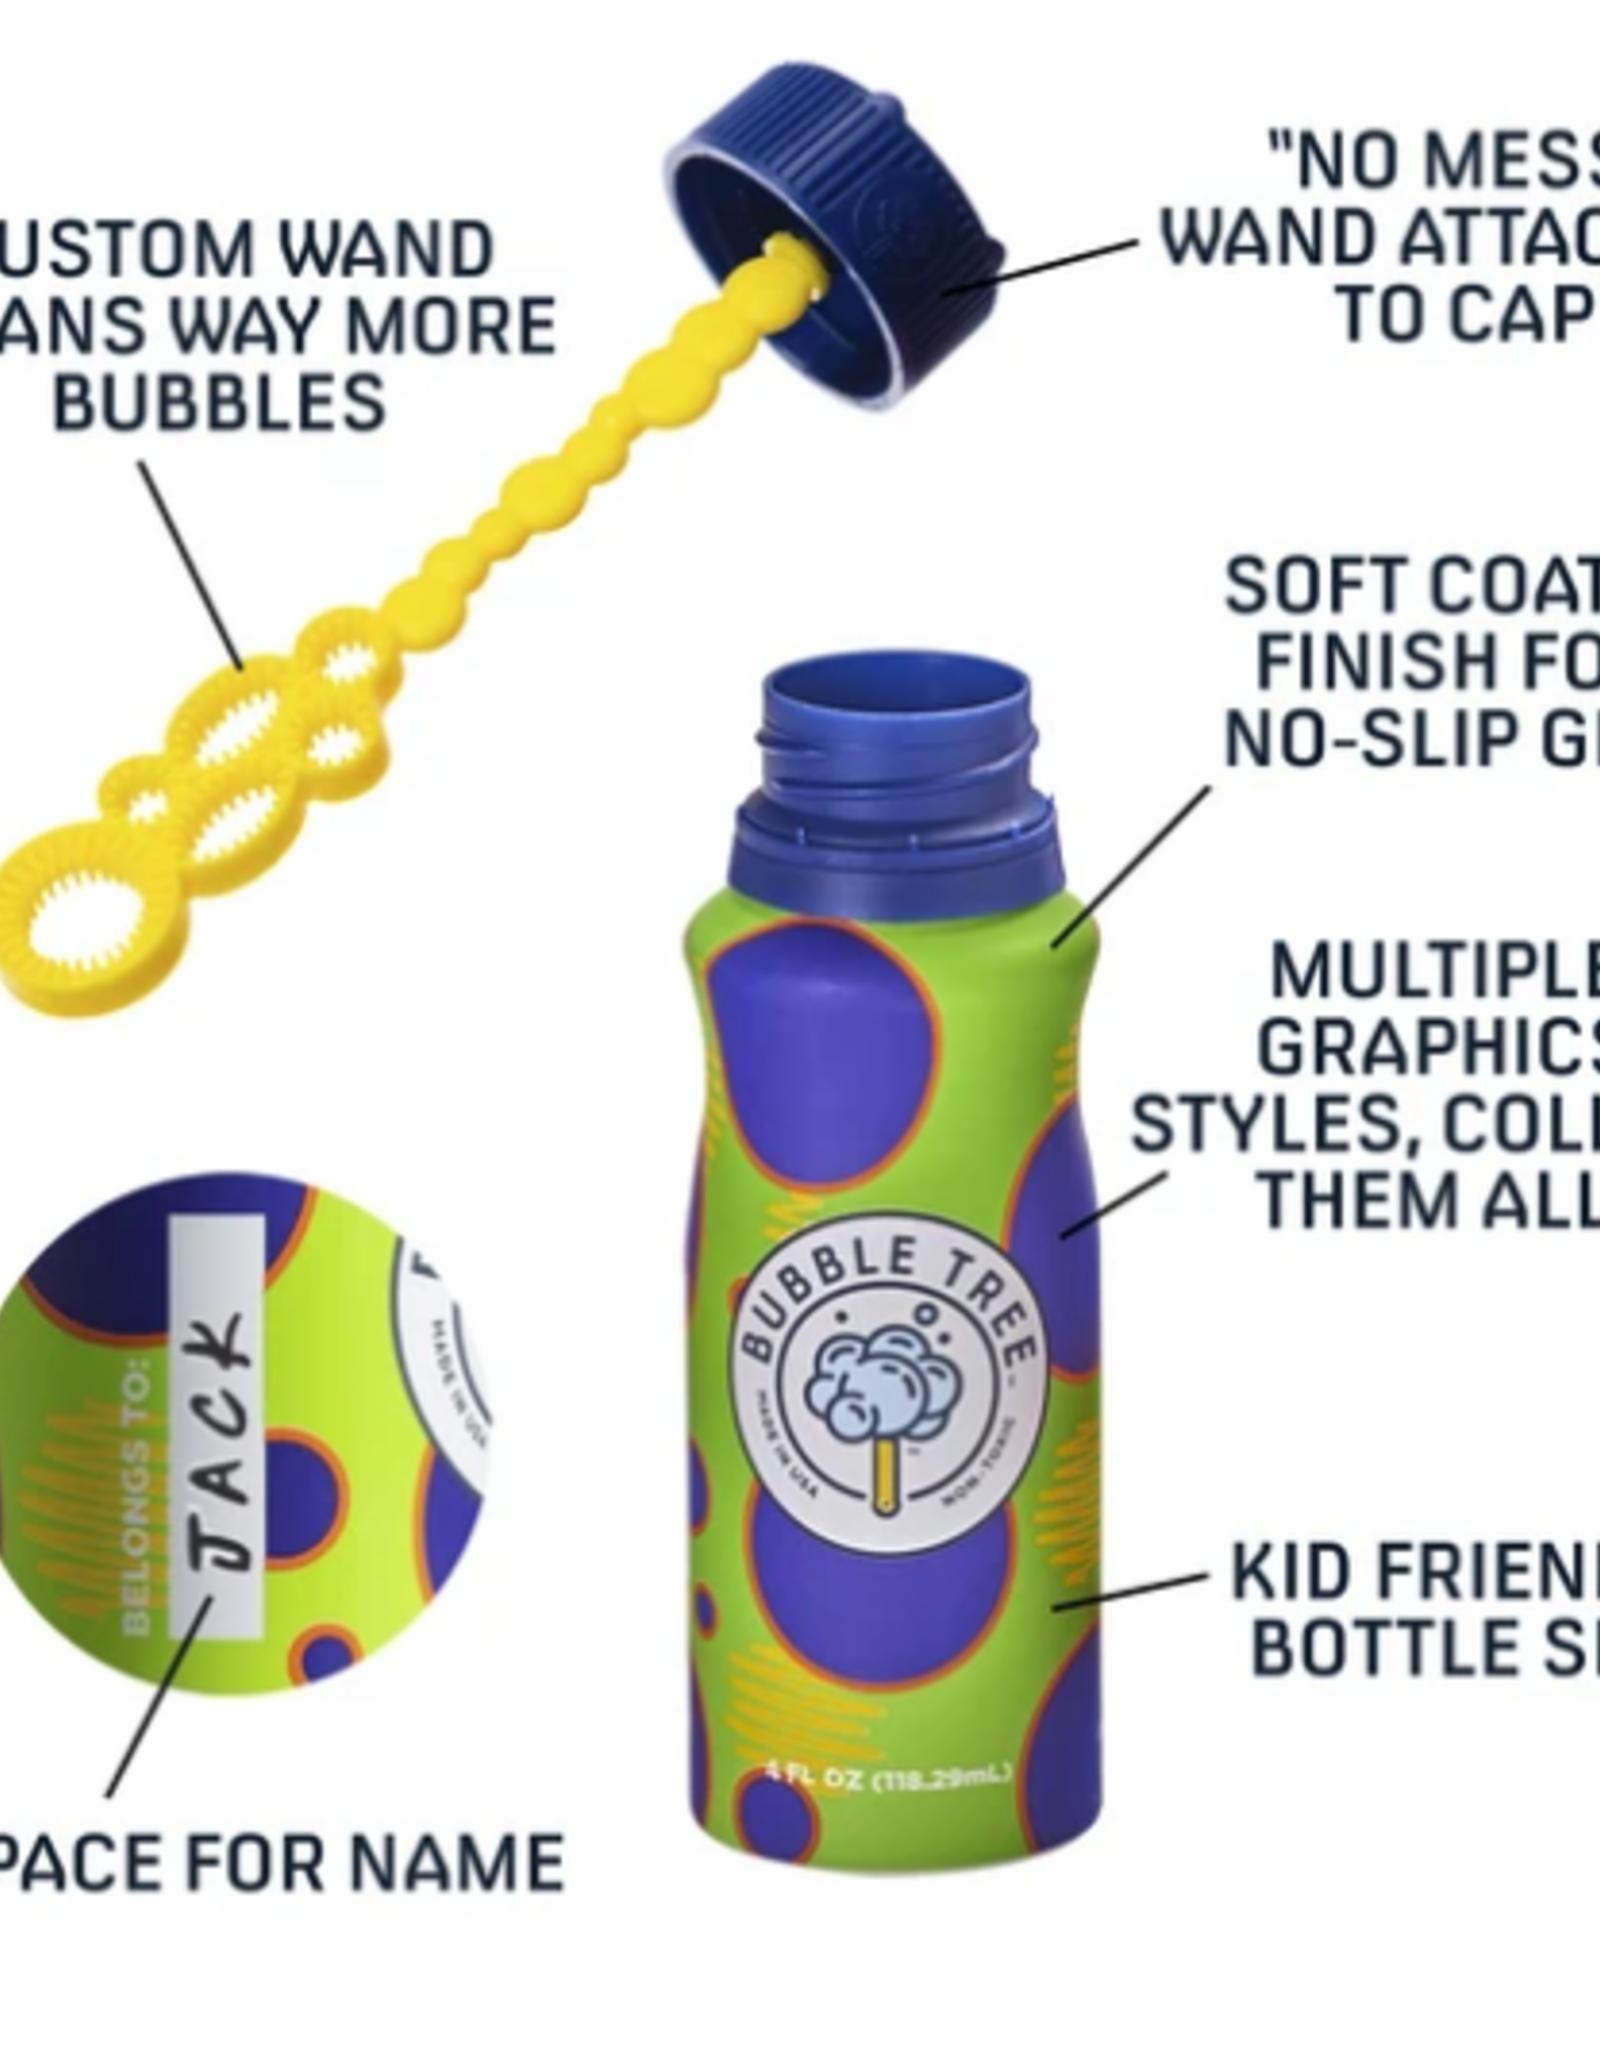 Bubble Tree 4-pack Original Refillable bubble system bottles